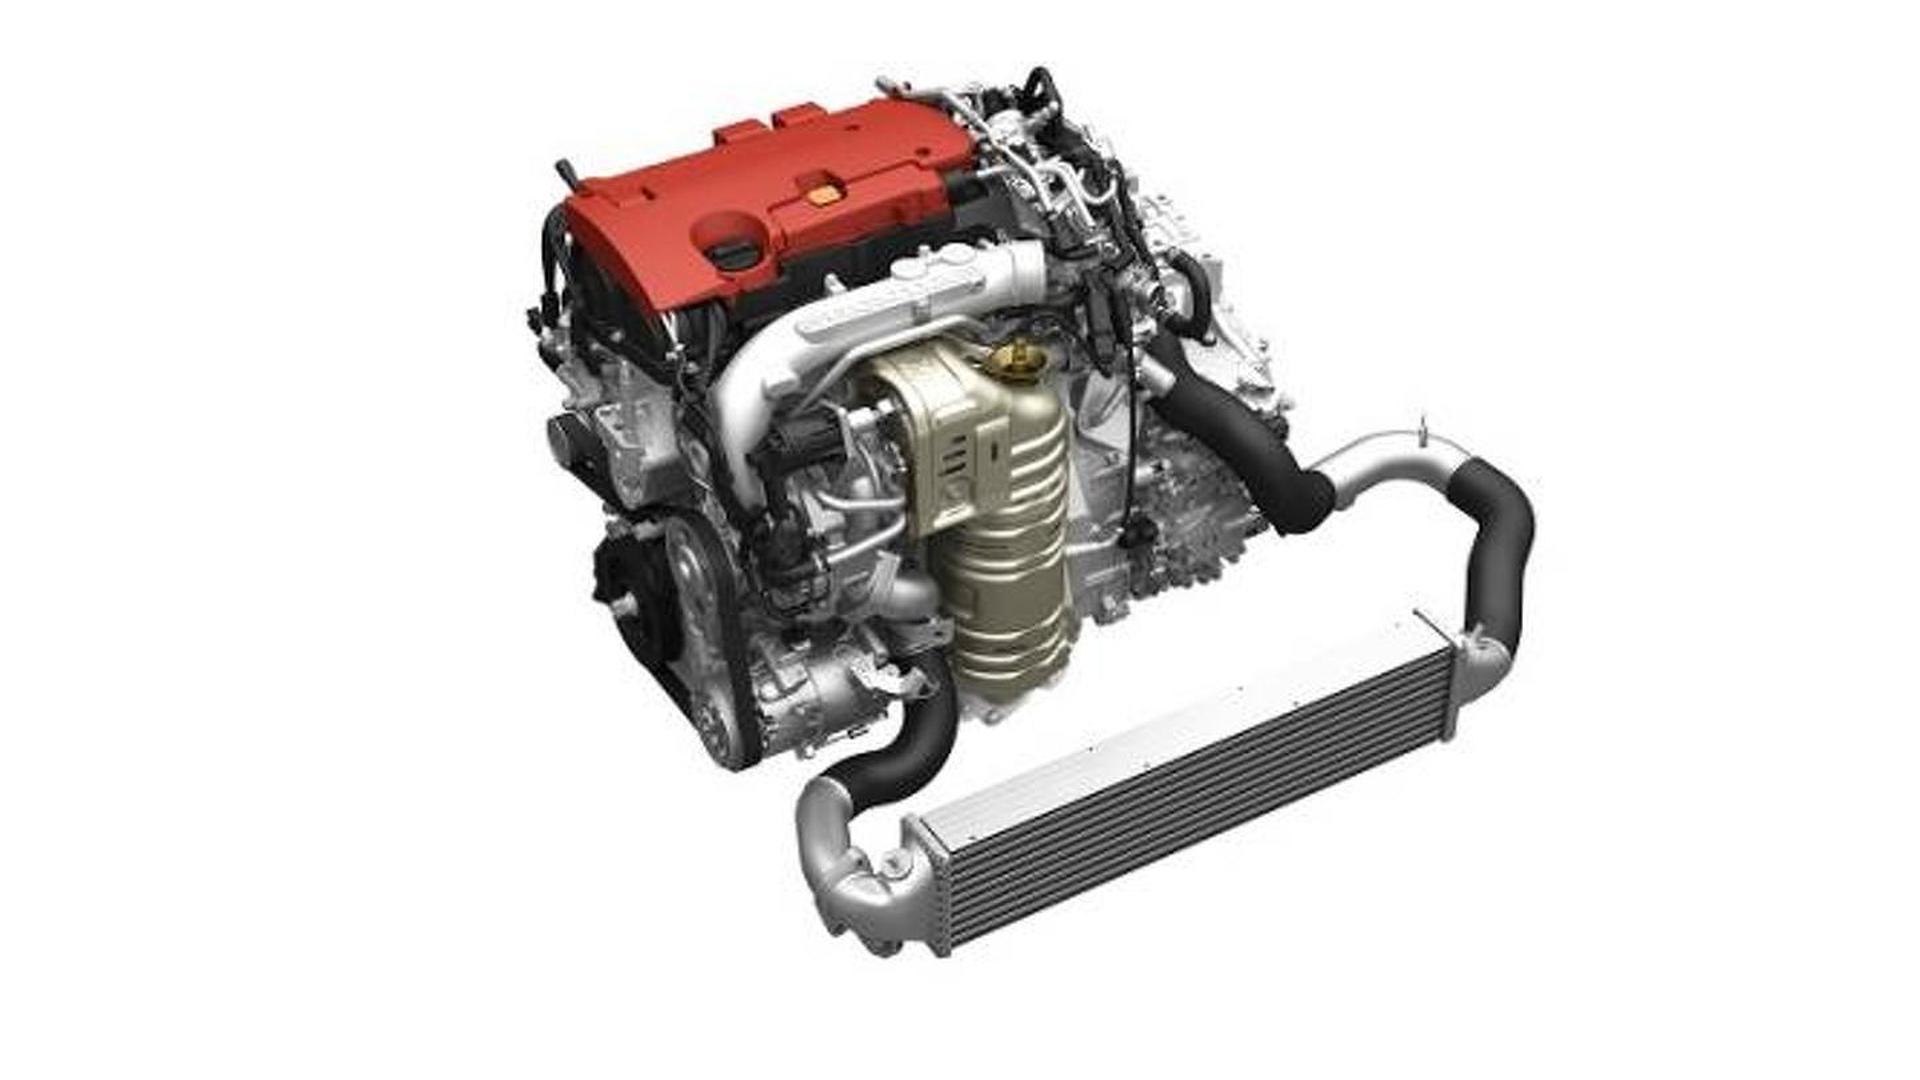 Honda reveals 1.0-, 1.5- and 2.0-liter VTEC TURBO engines